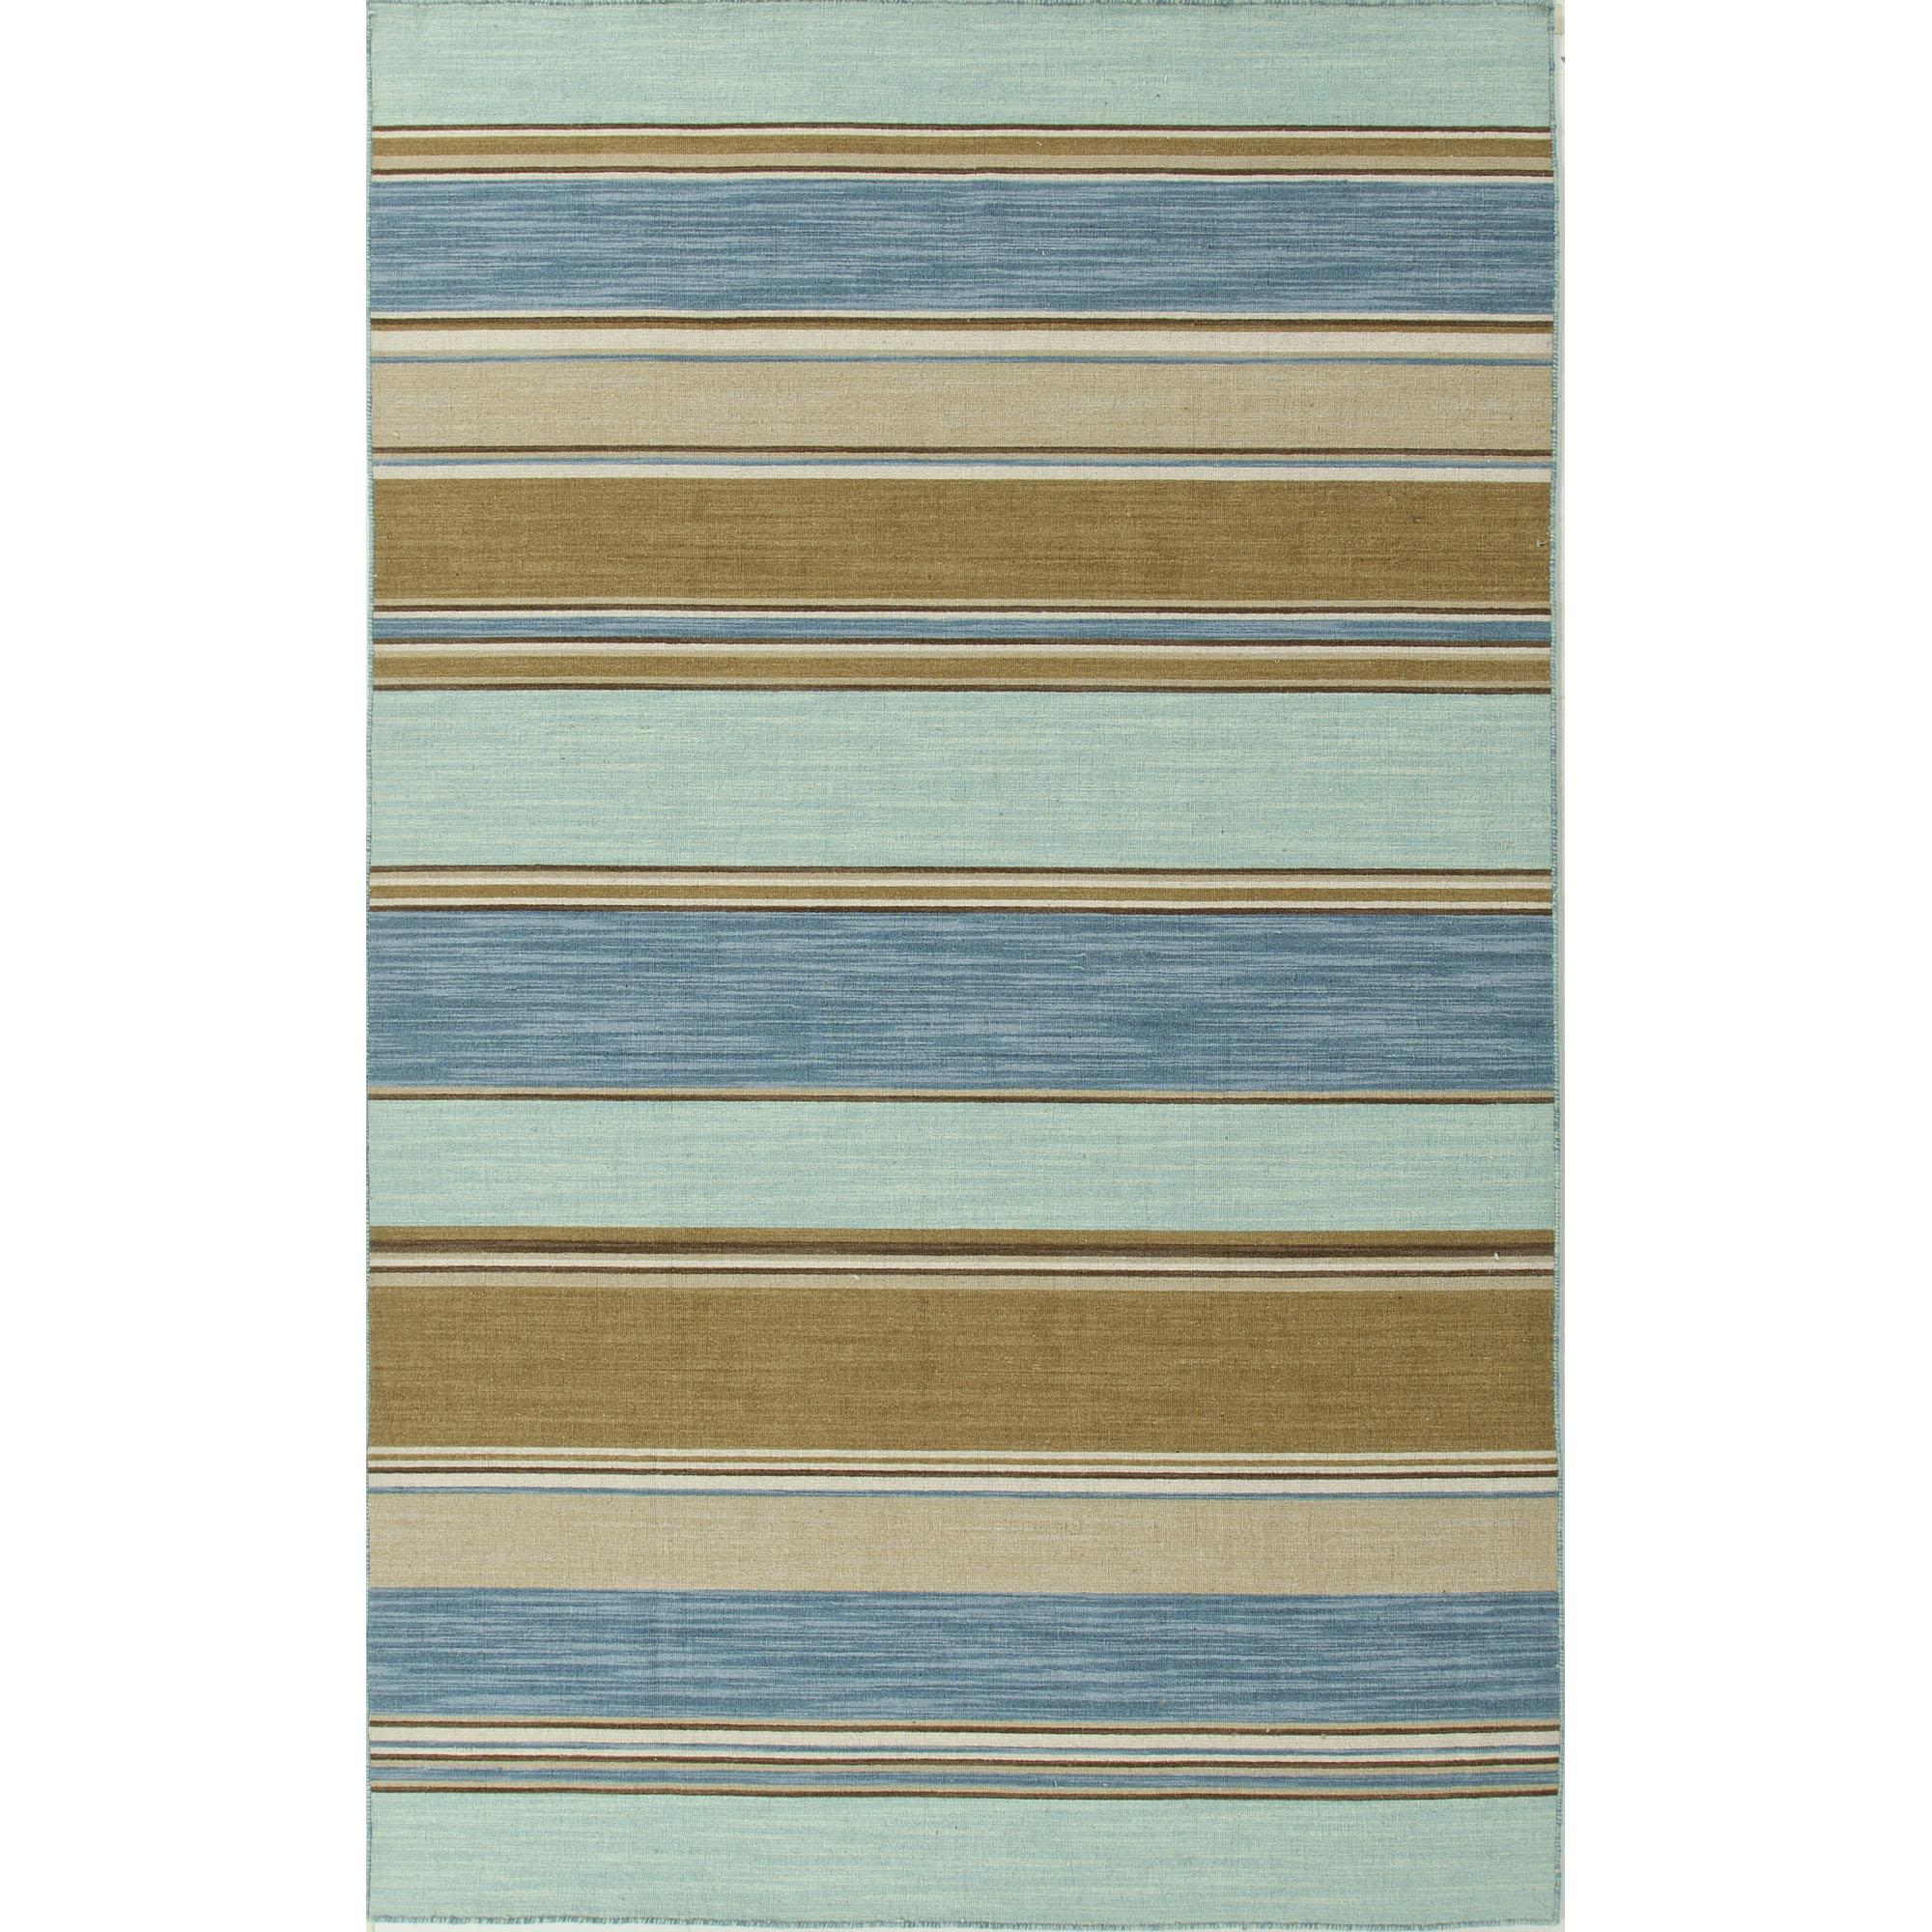 JAIPUR Rugs Coastal Shores 9 x 12 Rug - Item Number: RUG122775